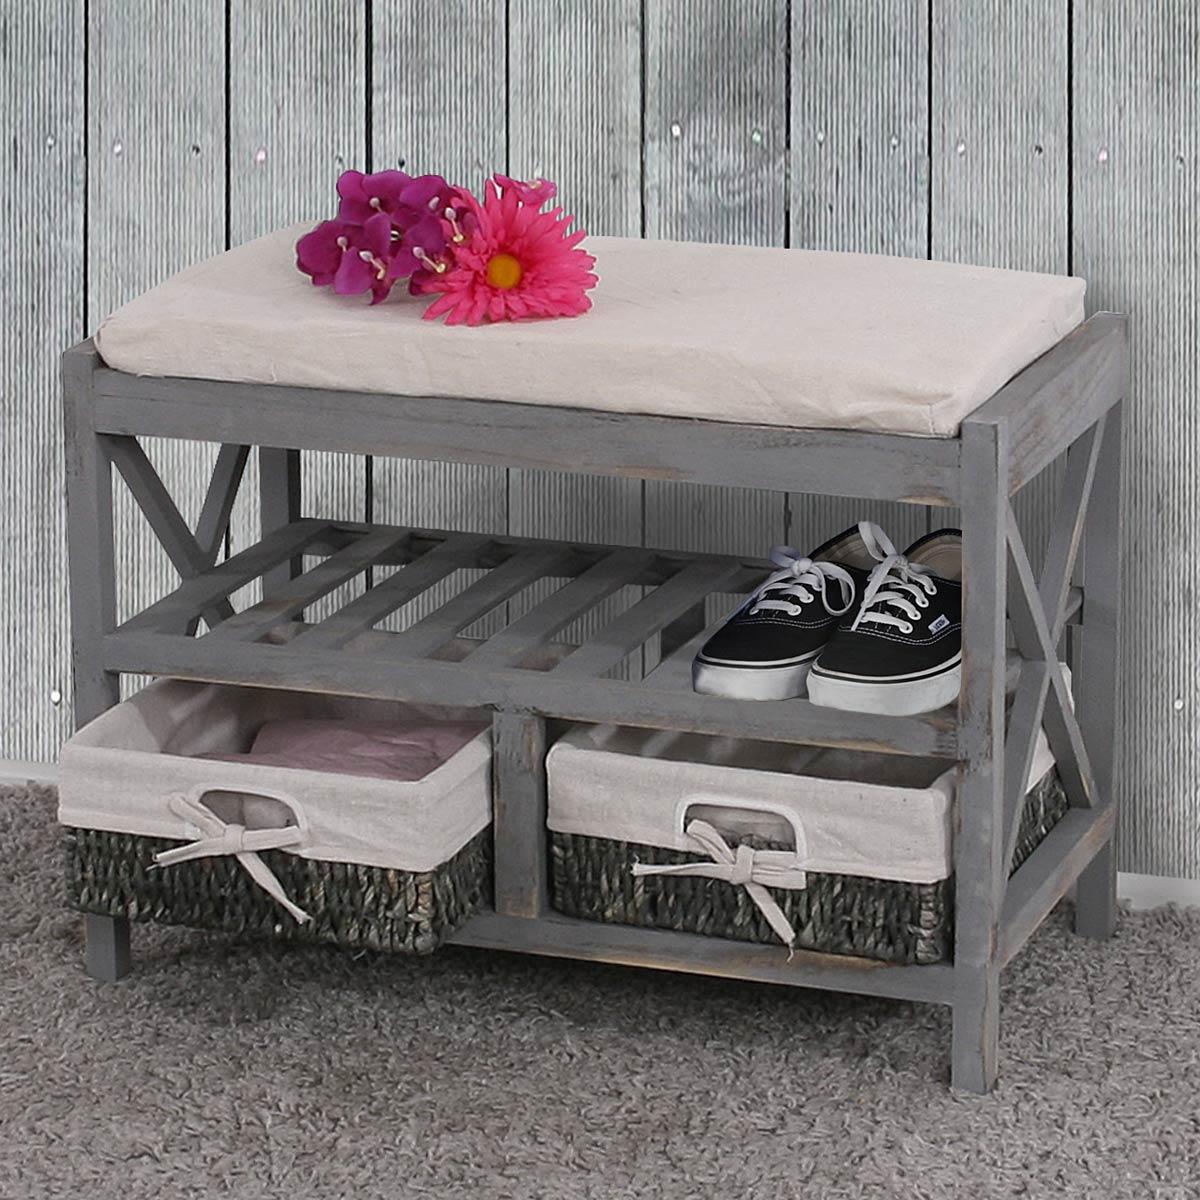 schuhregal sitzbank 45x65x34cm shabby look vintage grau. Black Bedroom Furniture Sets. Home Design Ideas